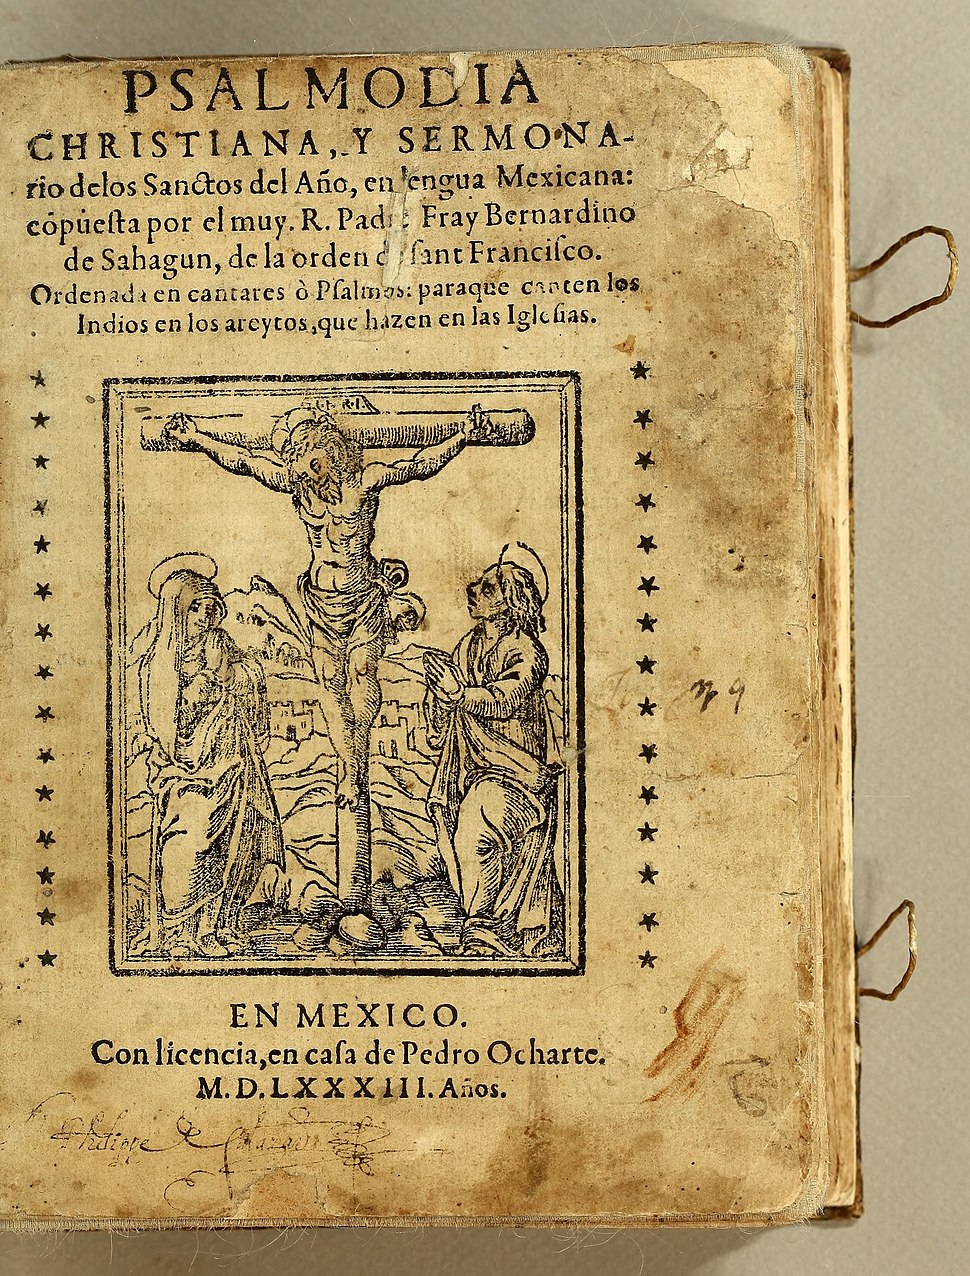 Psalmodia Christiana Bernardino de Sahagún 1583 title page